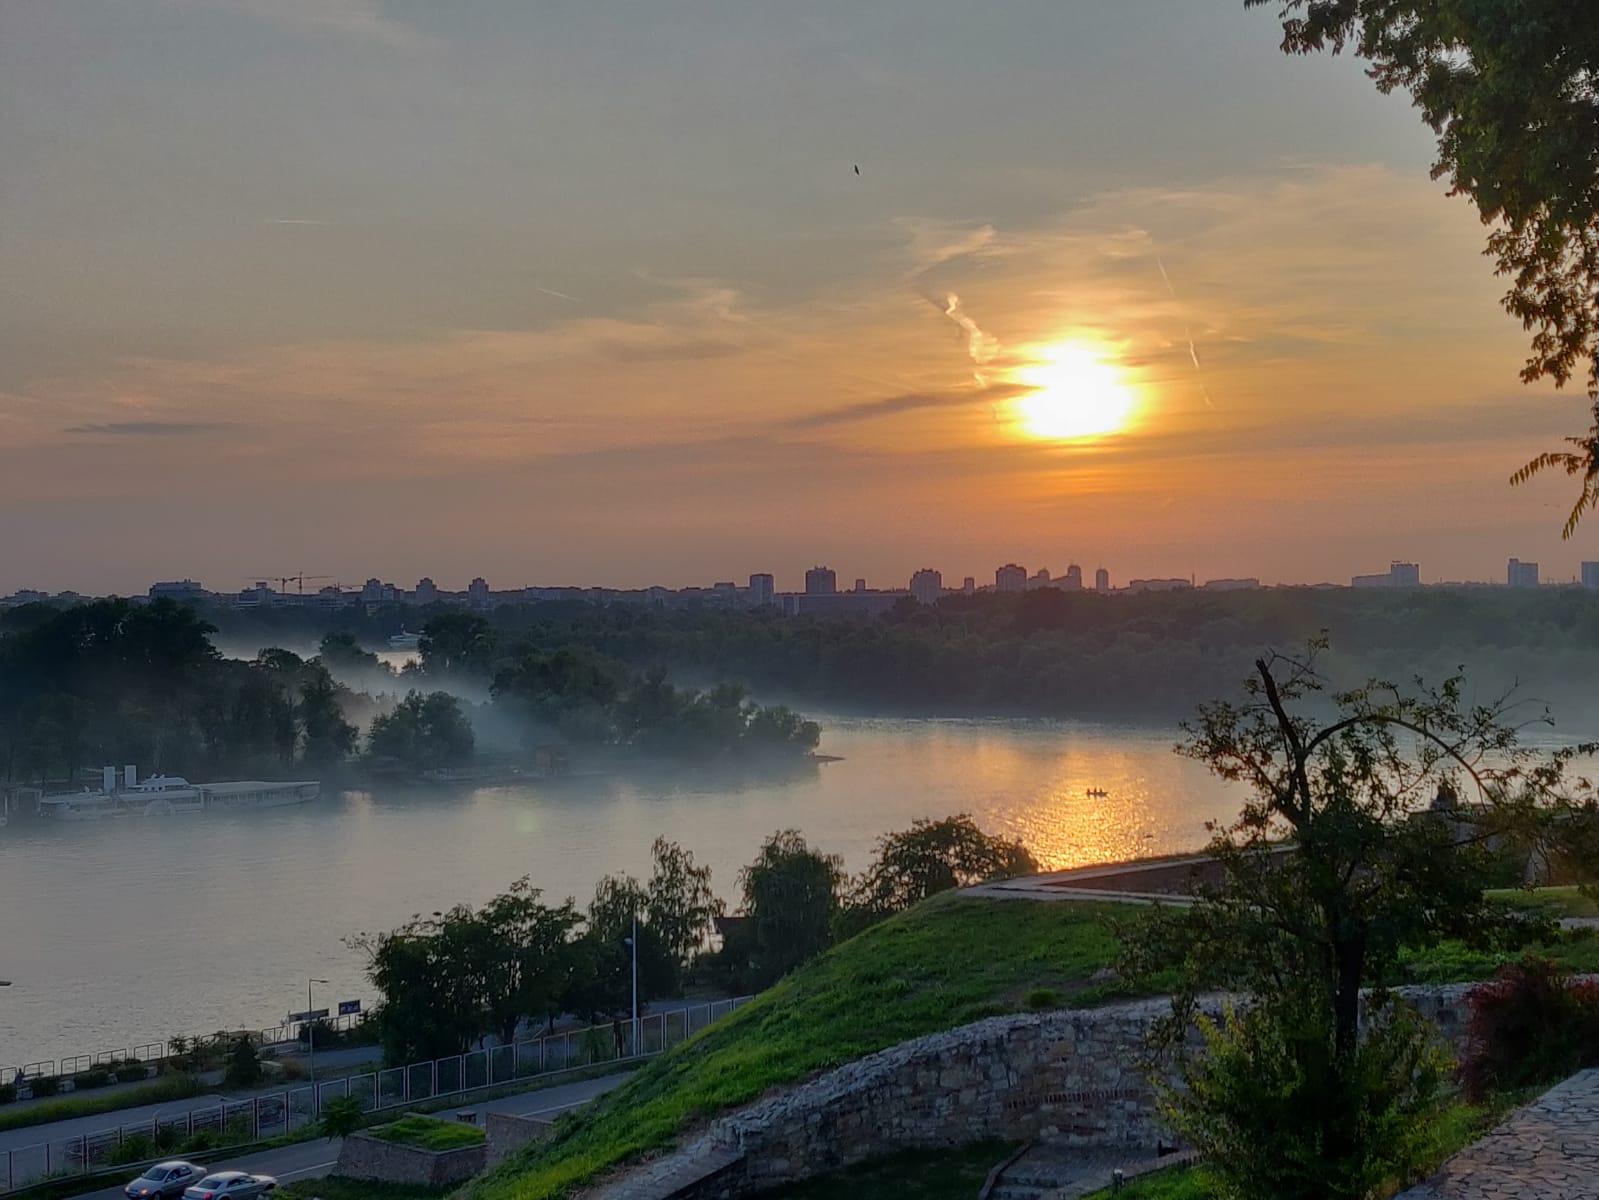 Serbia, Belgrad, fot. Marzena Zięba